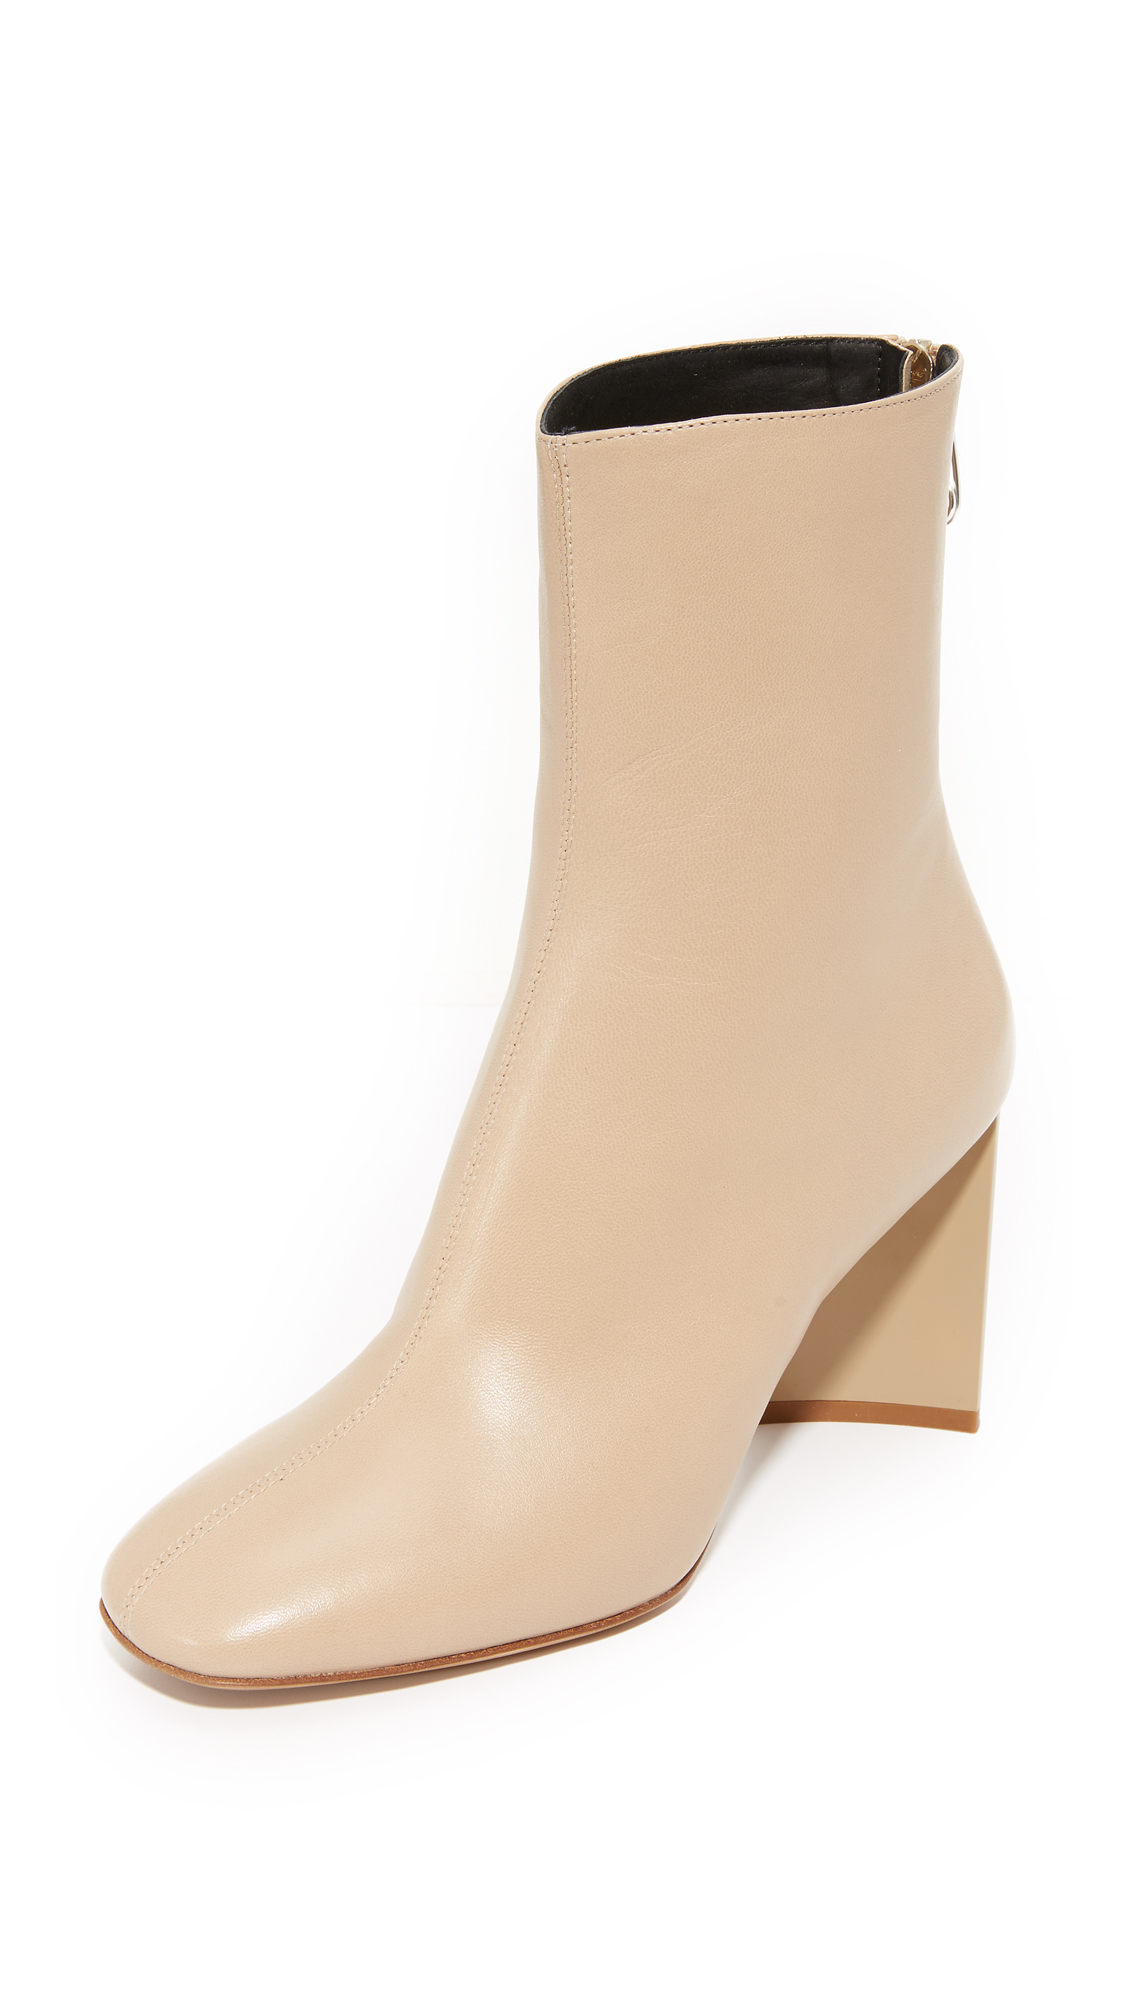 Maison Margiela Cutout Heel Ankle Booties - Nude